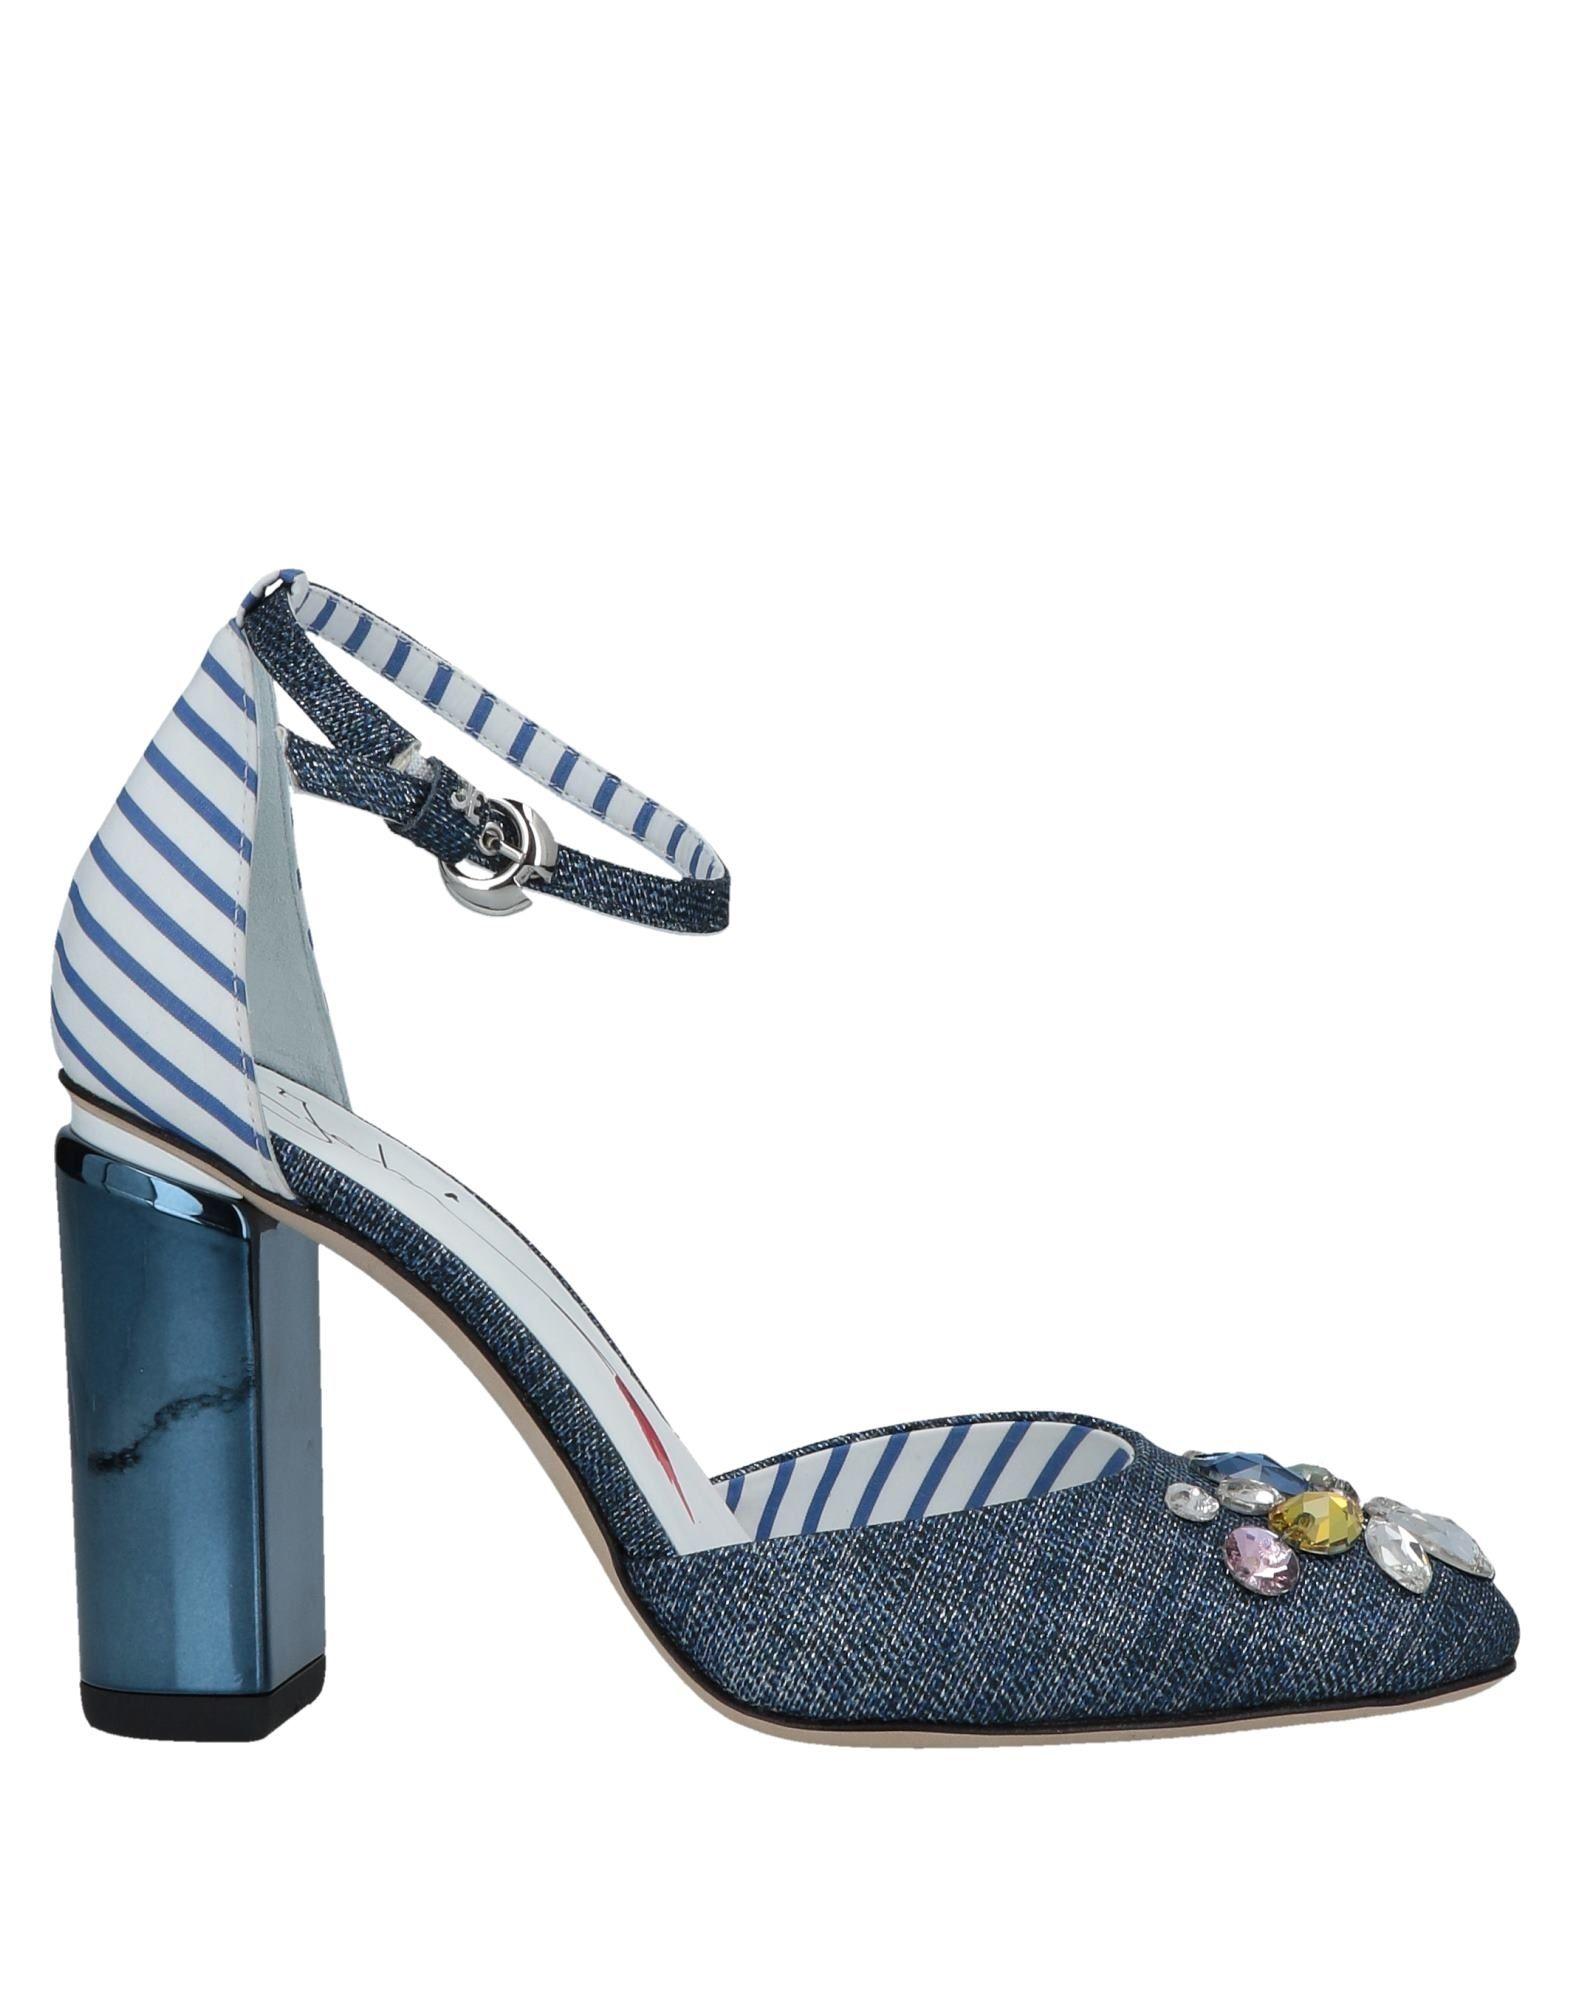 De Salón Fabi Zapatos Zapatos De De Mujer Fabi Mujer Zapatos Salón NyOmn0wv8